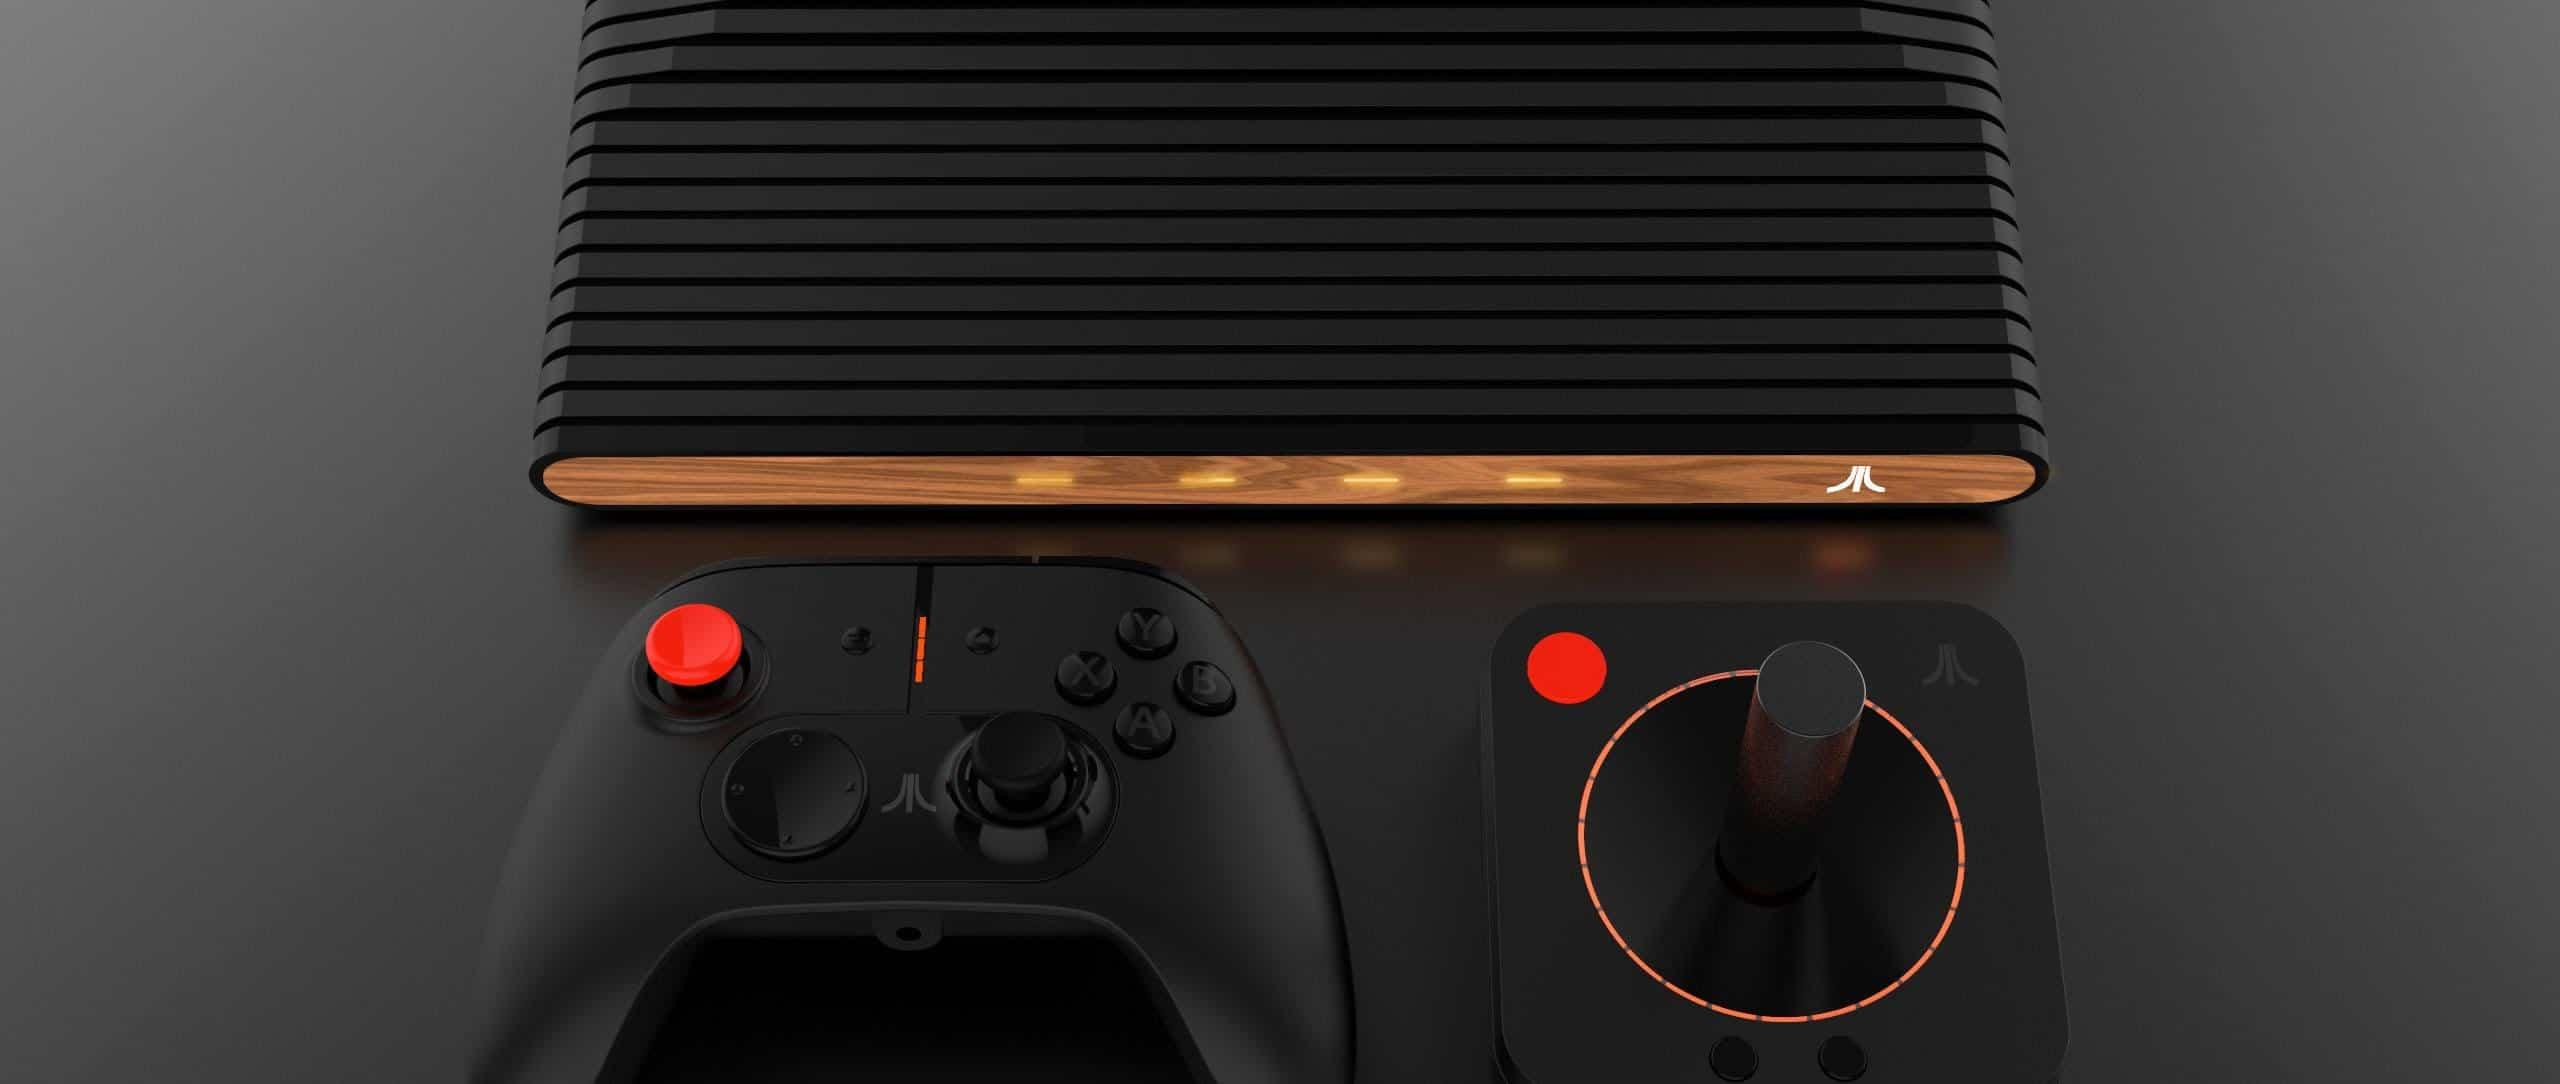 Photo of الكشف عن العديد من التفاصيل المثيرة لمنصة ألعاب Atari VCS القادمة – أقوى من PS4 و Xbox One؟